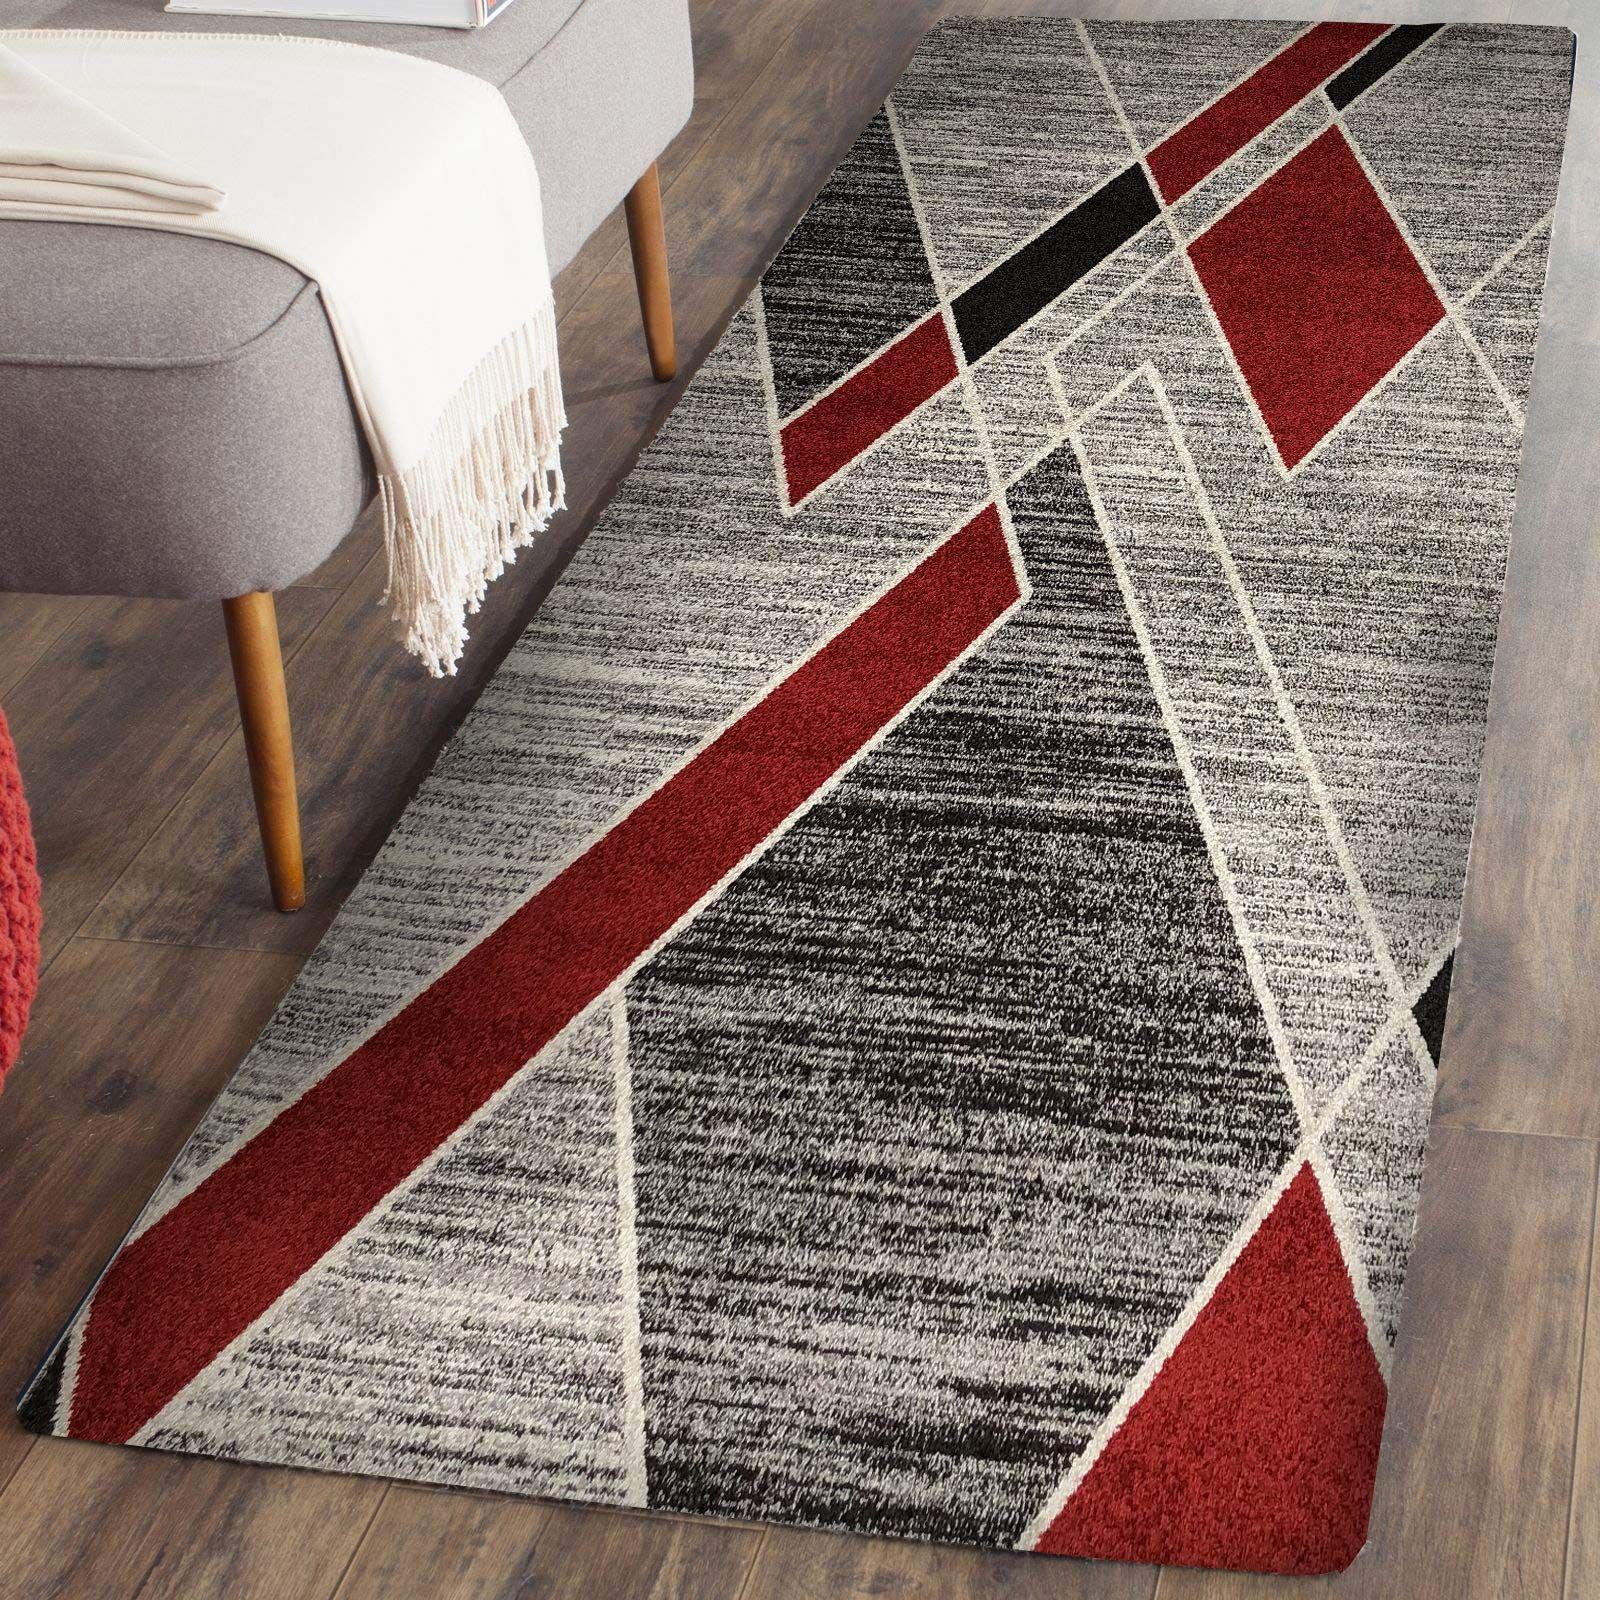 Prestige Decor Area Rugs 2x5 Living Room Rug Carpet Grey Red For